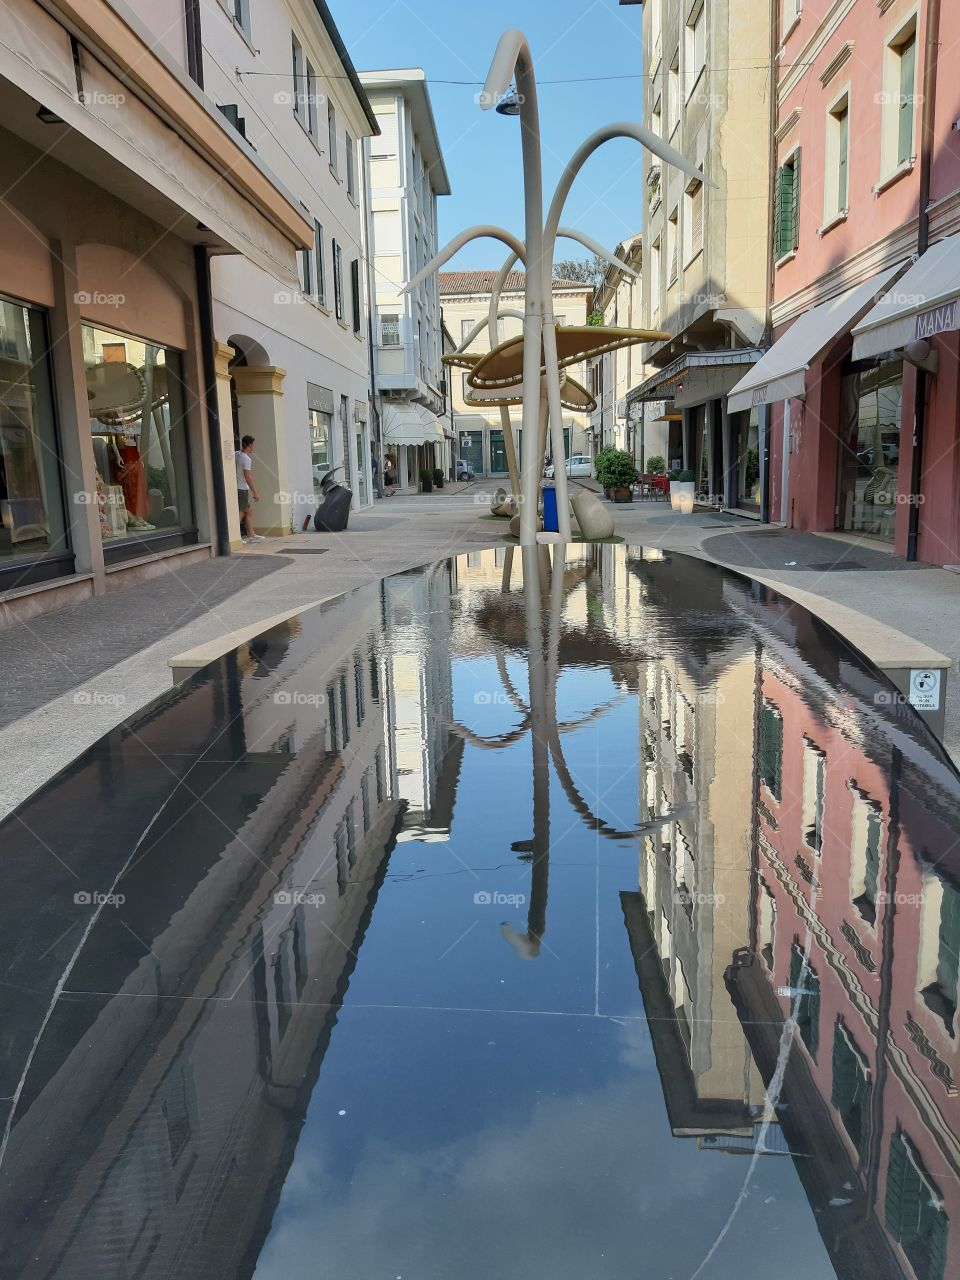 reflection cify